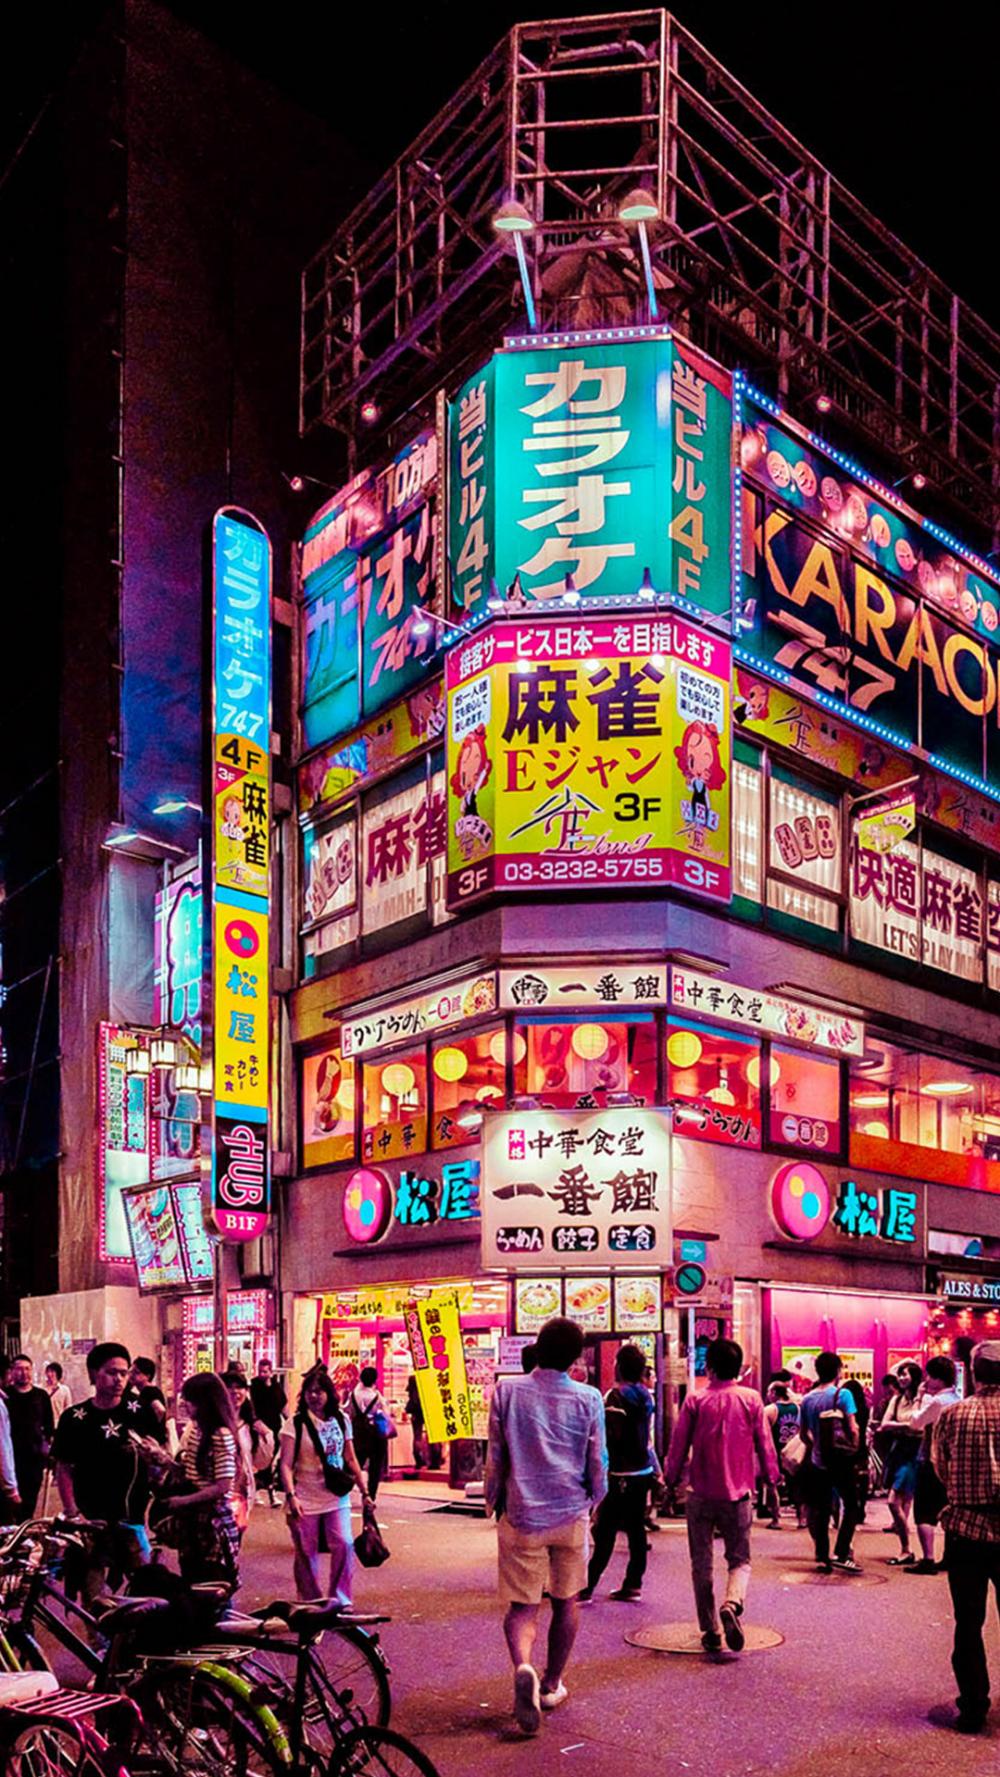 Phone Wallpaper Landscape Japan City Tokyo 6wallpaper Wallpaprs Background Iphone Iphone11 Iphonewal Tokyo Photography Japan Photography Aesthetic Japan